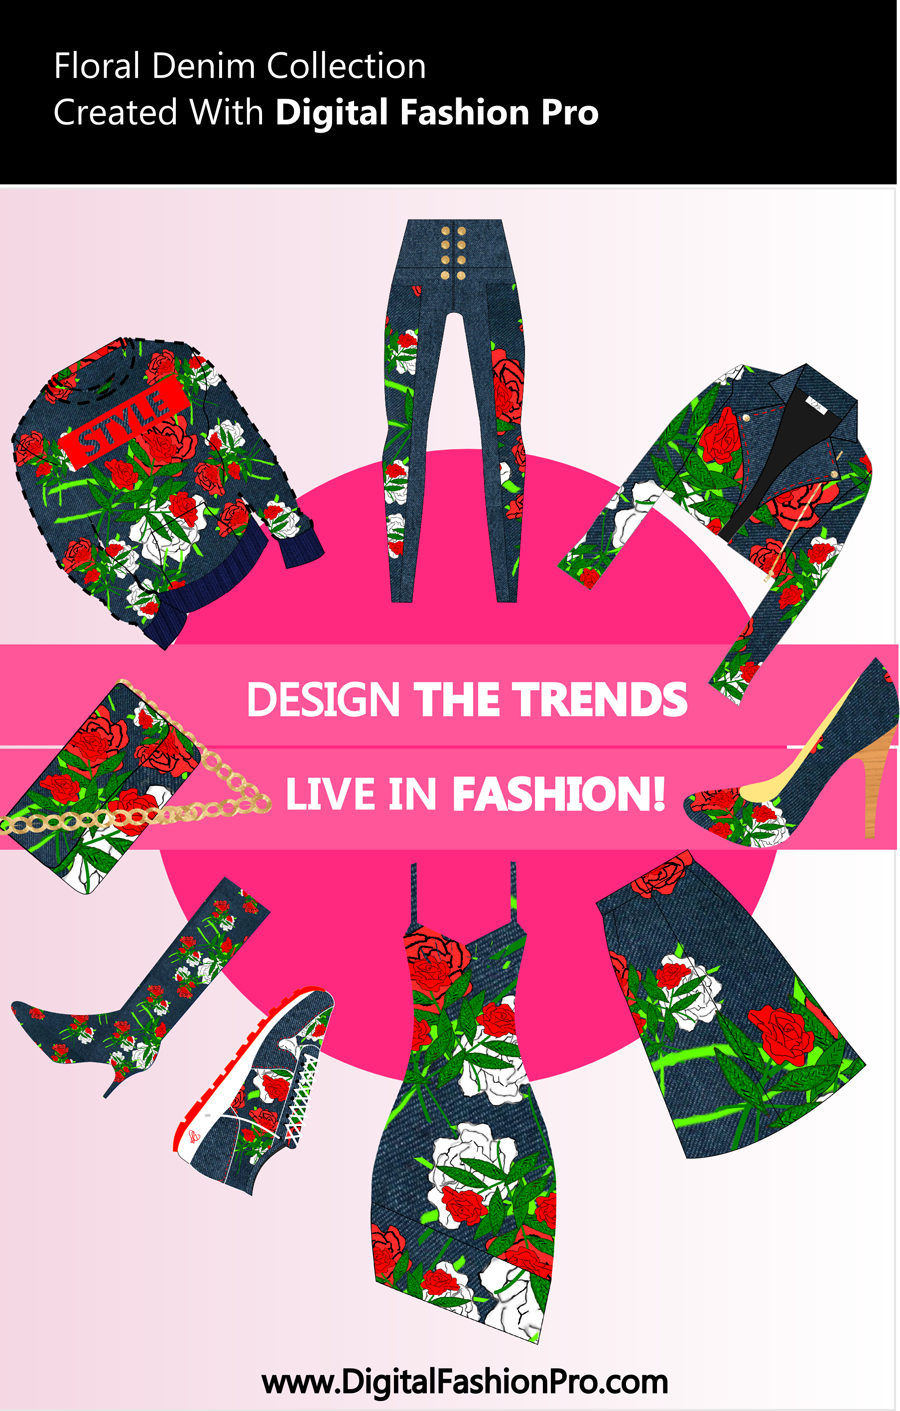 Fashion Magazine - Digital Fashion Pro - Fashion Design Software - Cover